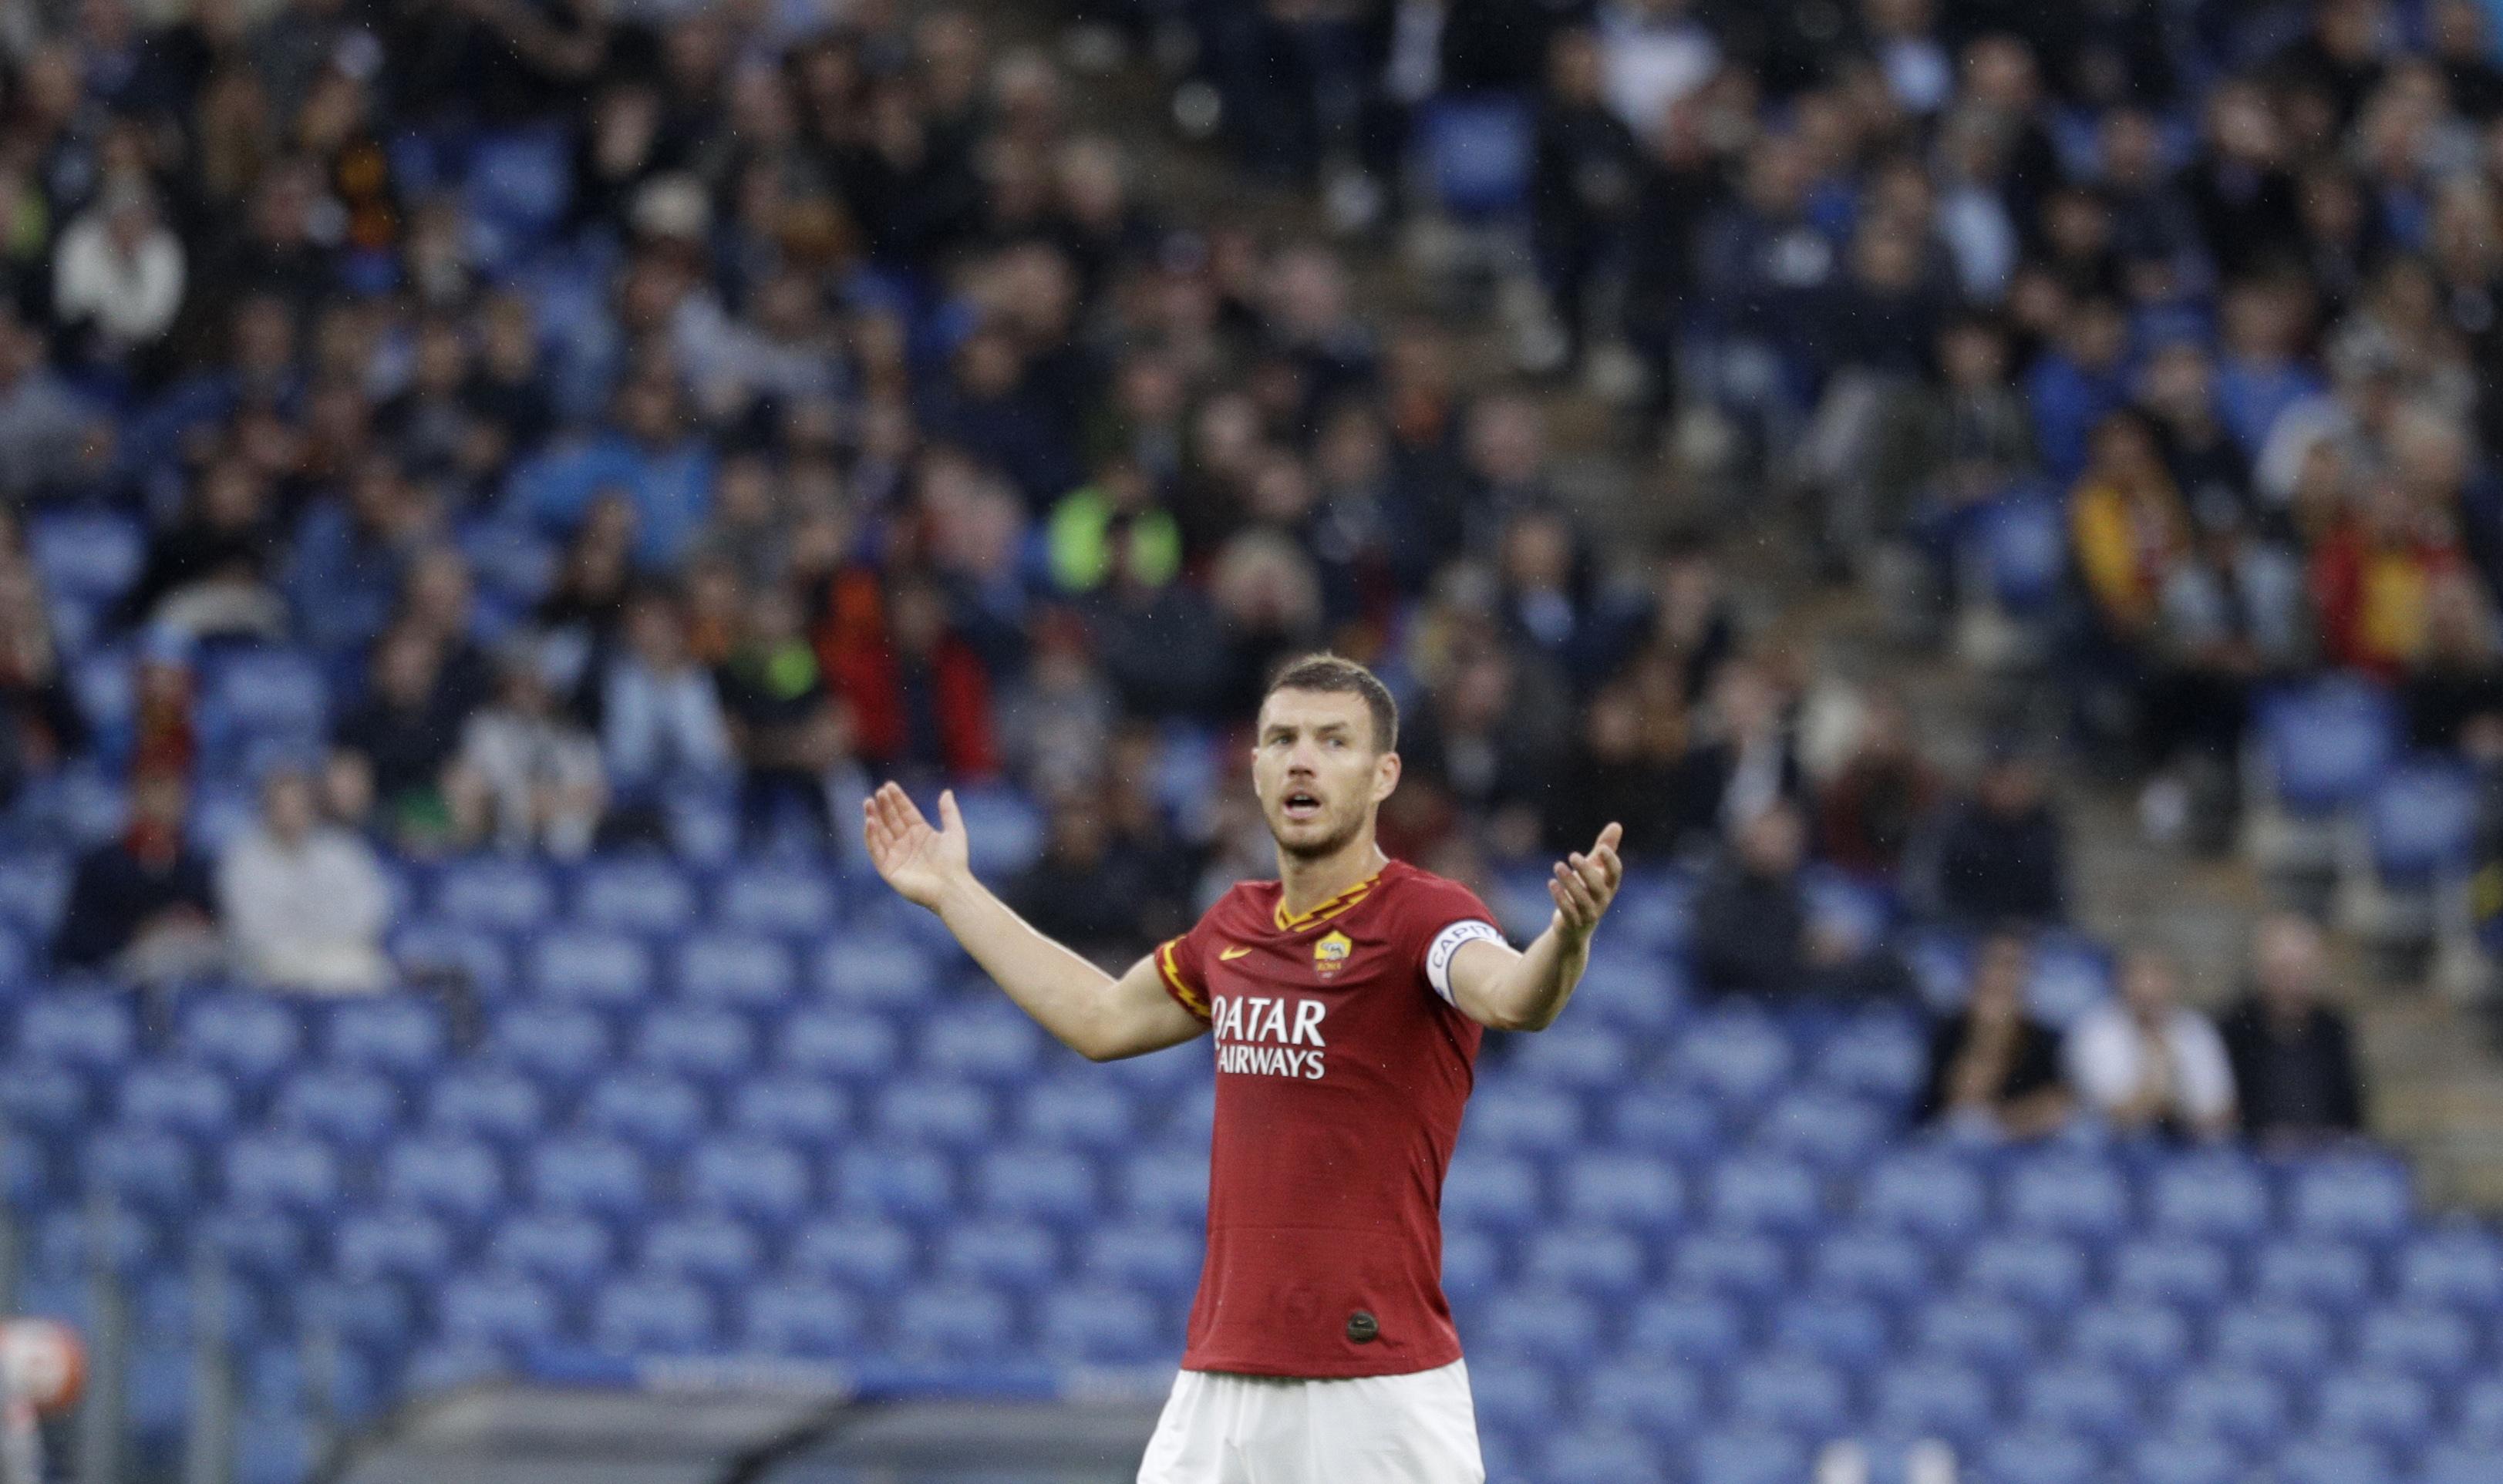 Discriminatory chants prompt suspension of Roma-Napoli game